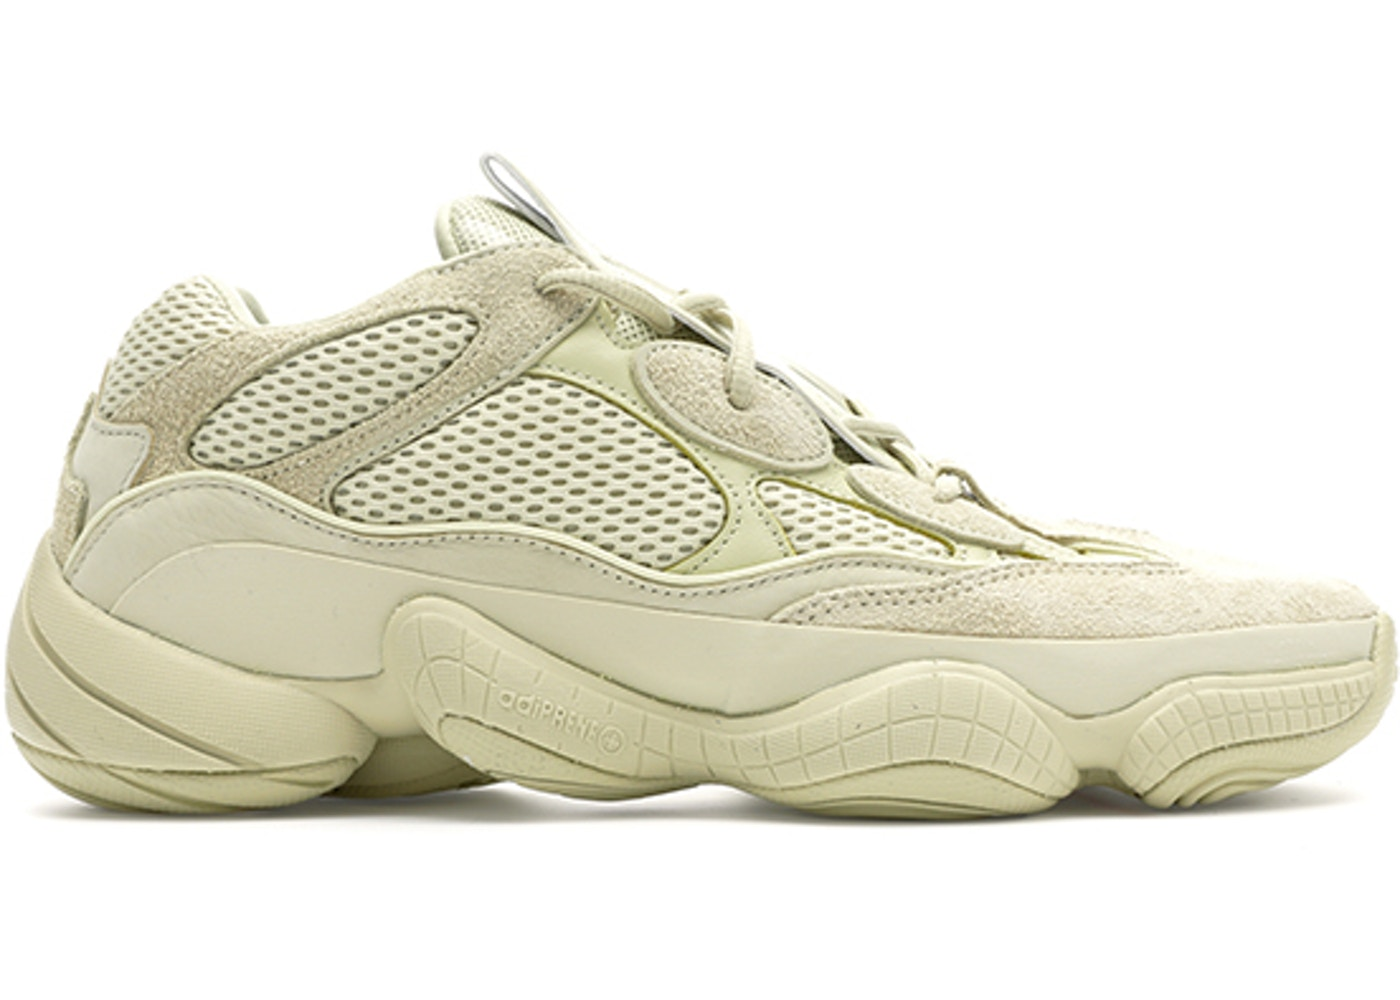 d27e31941df Buy adidas Yeezy Shoes   Deadstock Sneakers